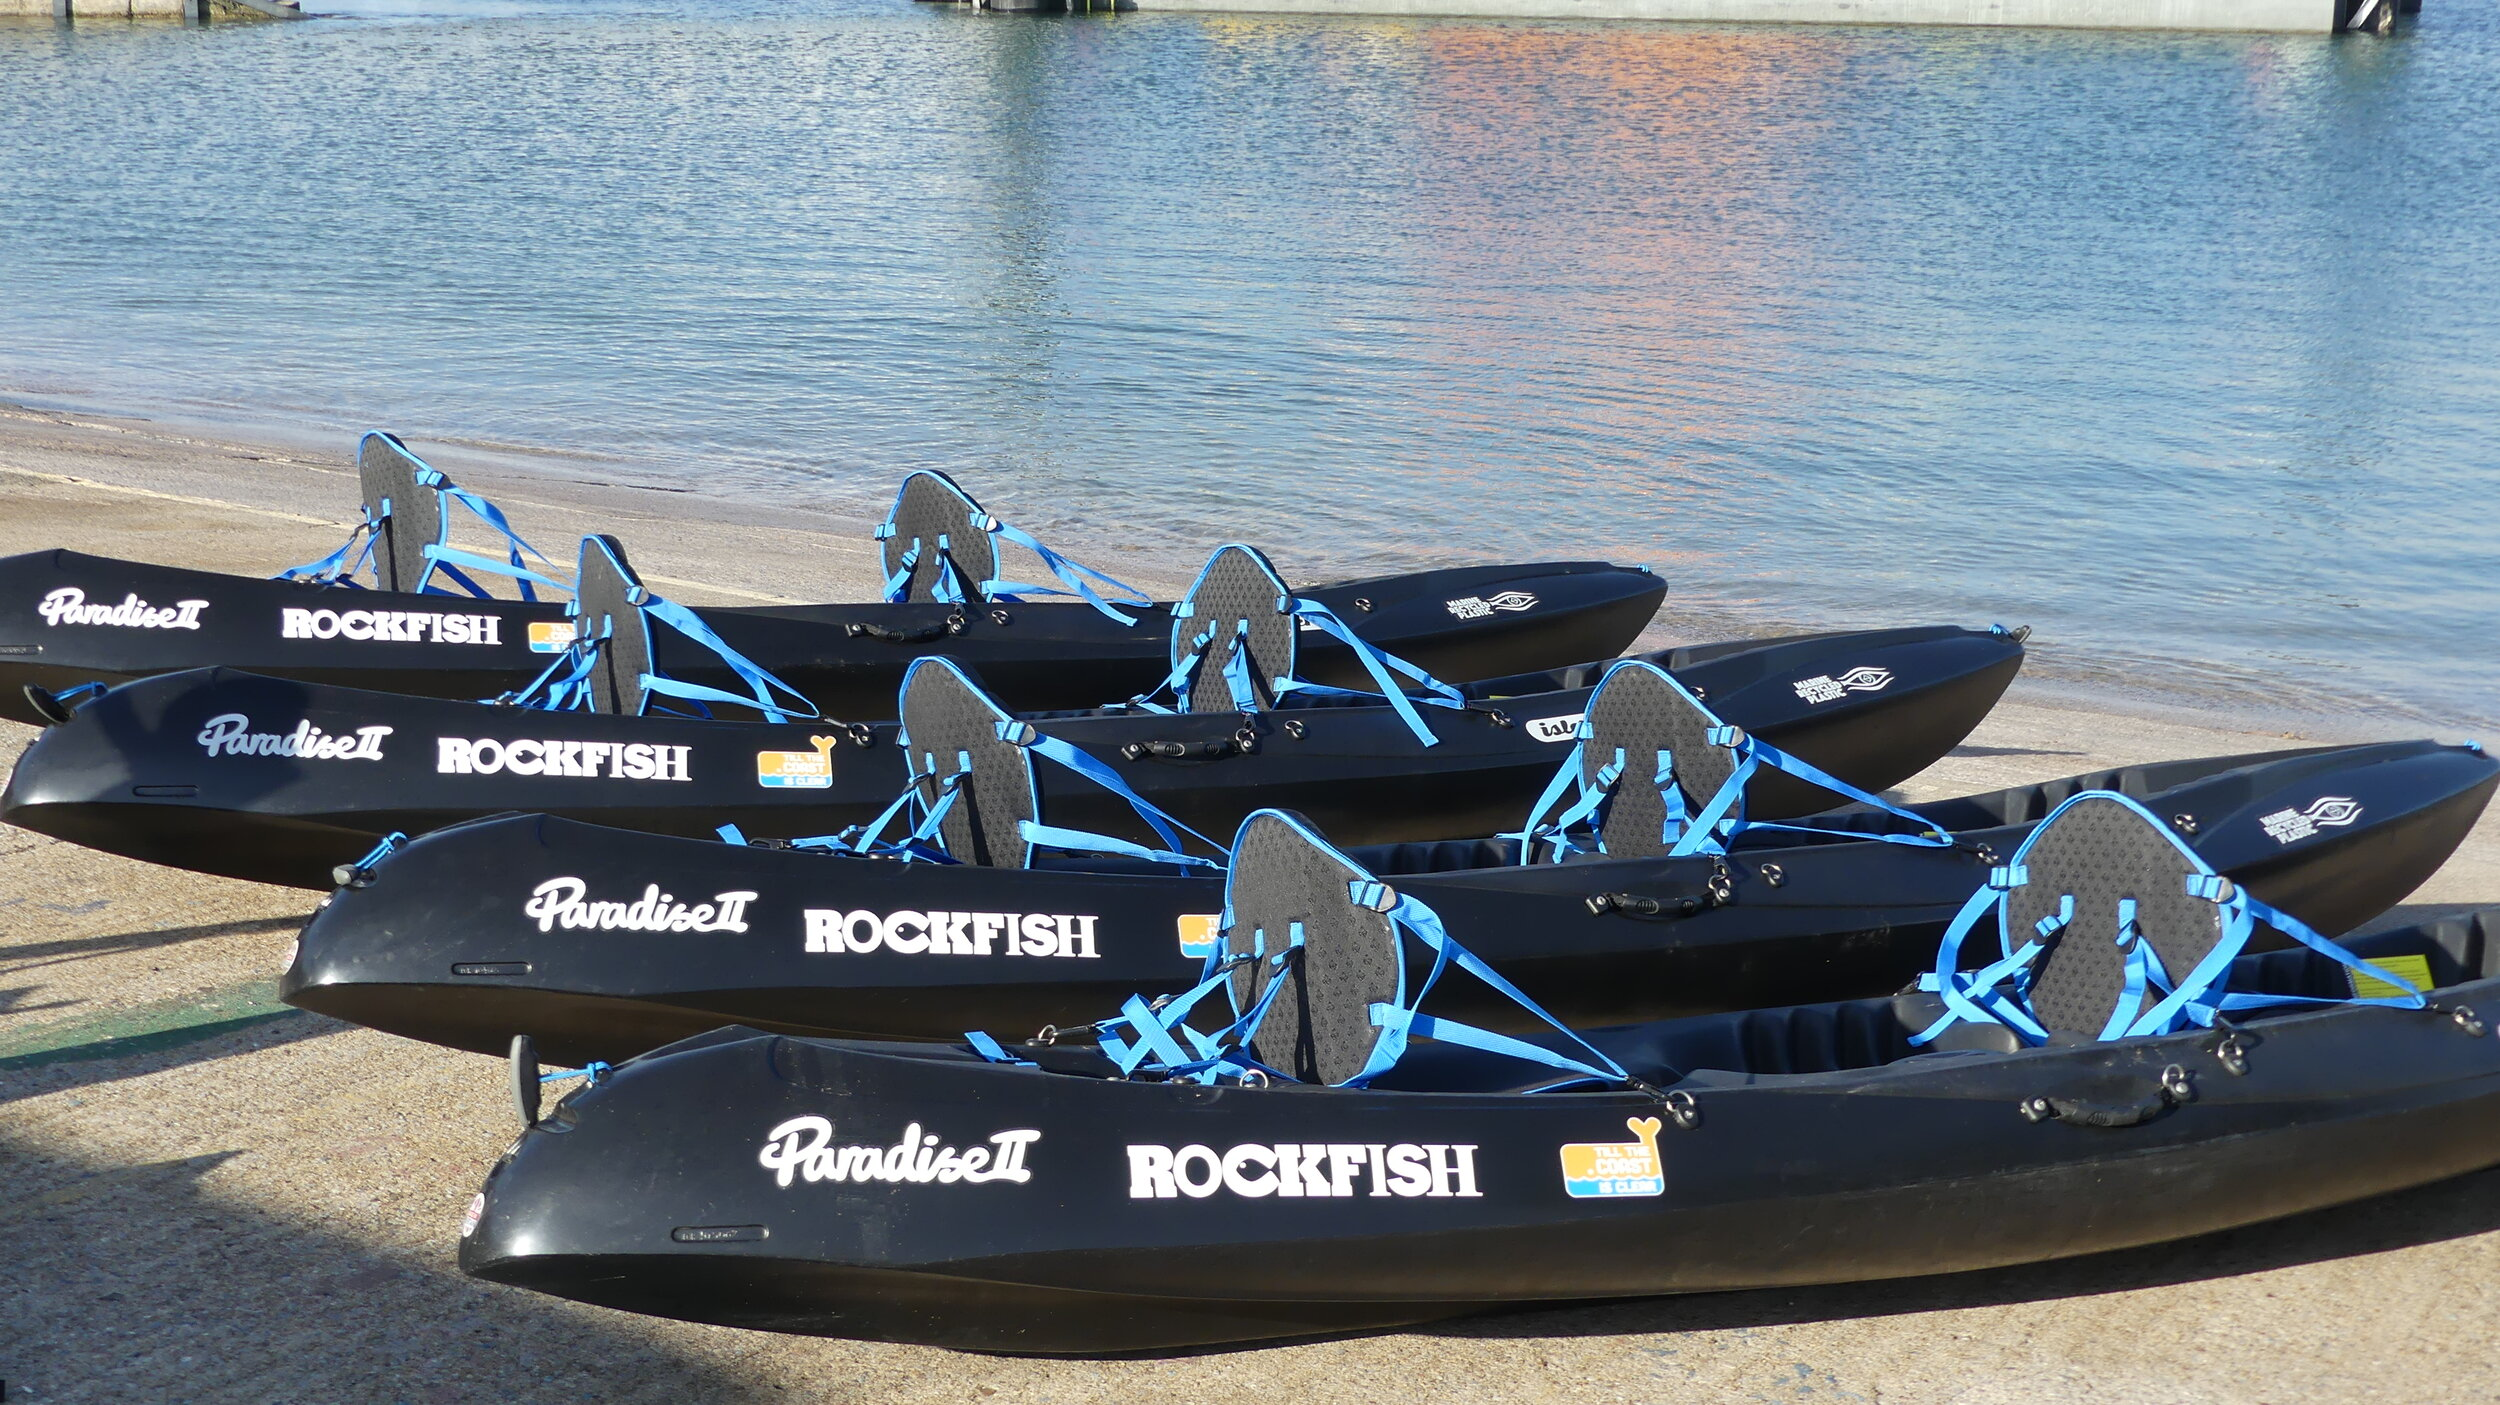 Marine Recycled Plastic Kayaks